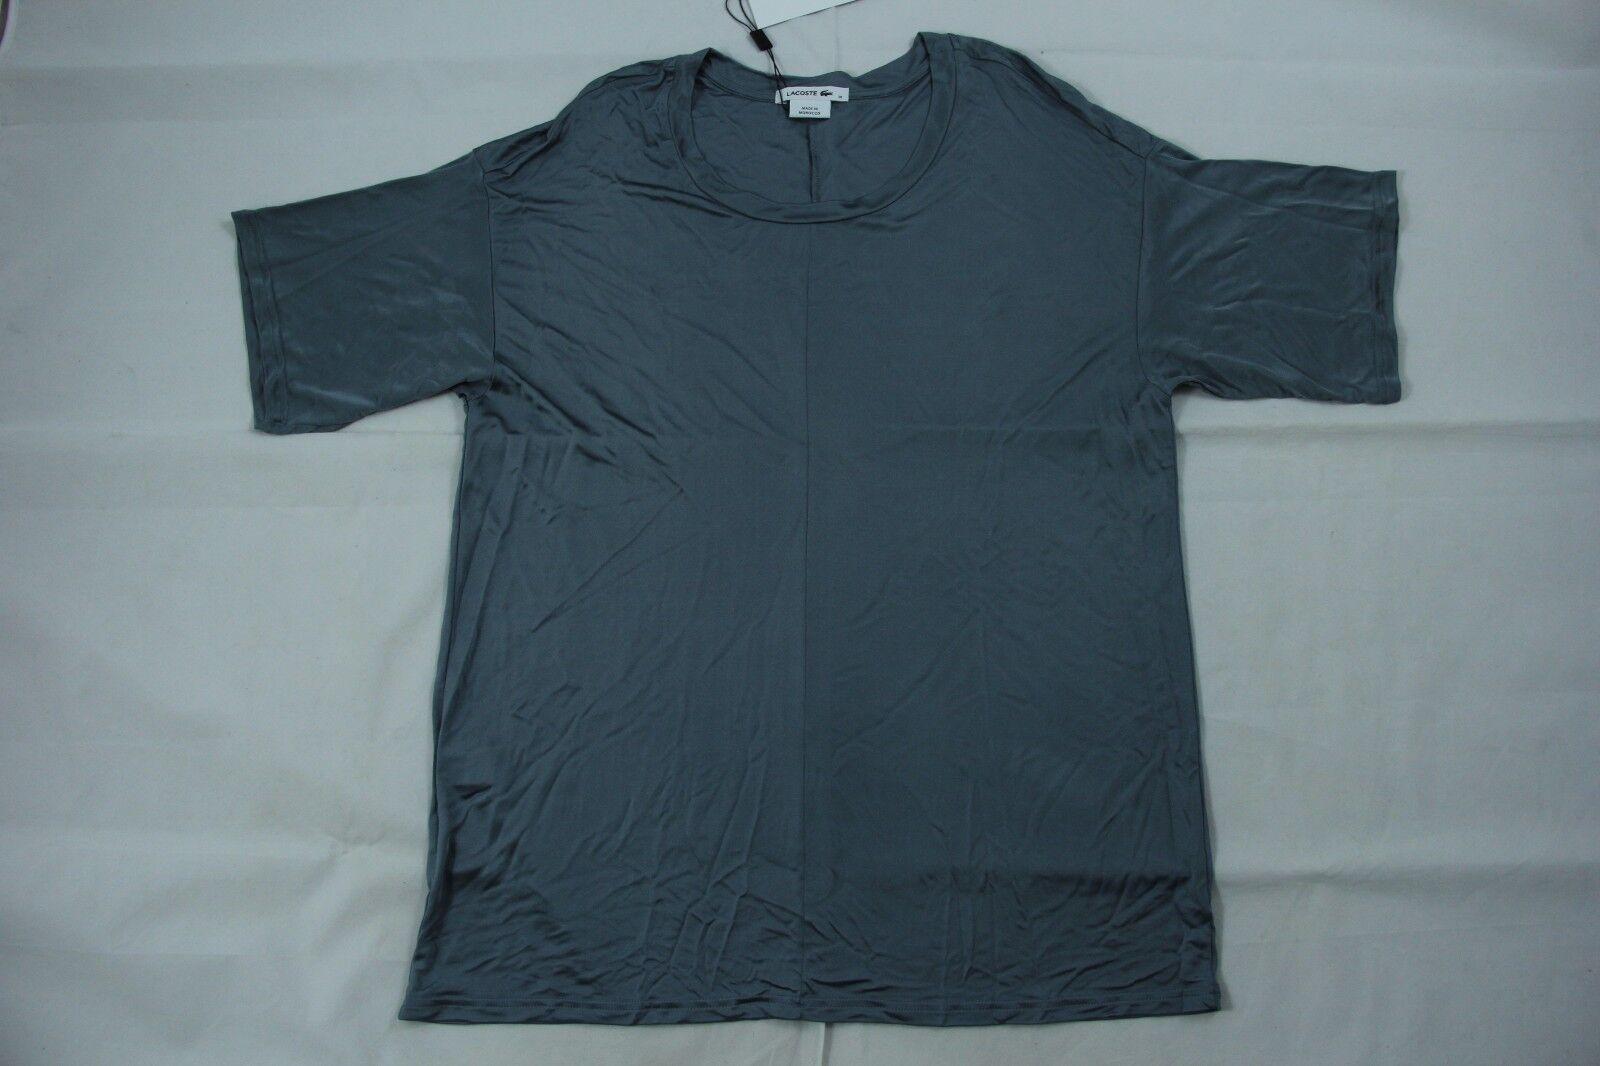 Lacoste Viscose T Shirt Titane Blau Farbe Sz. 6  TF6585 BNWT Authentic